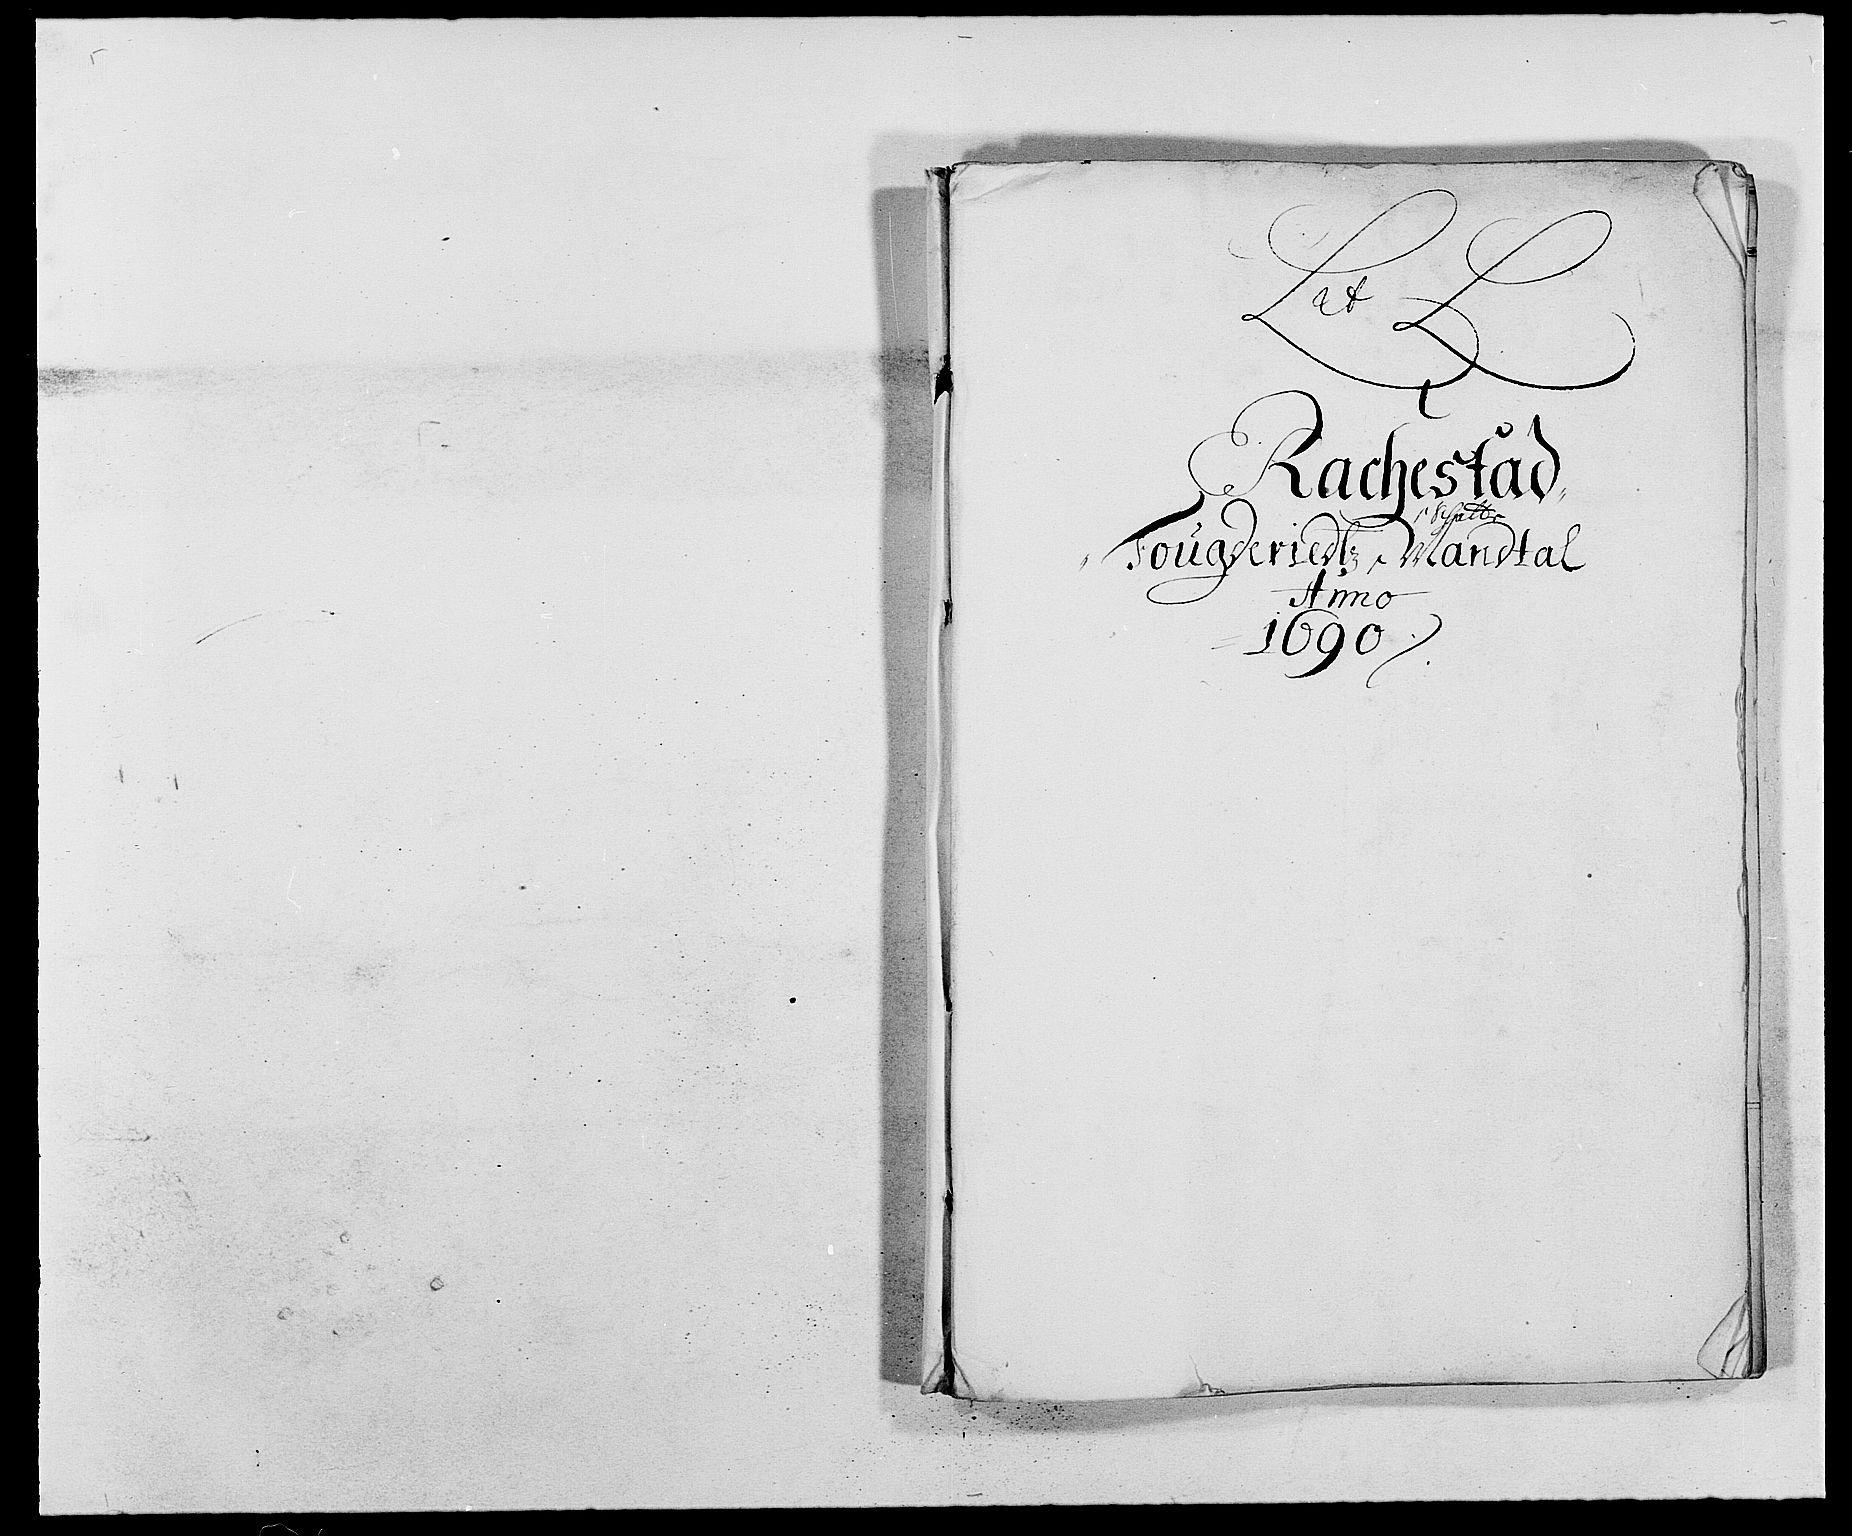 RA, Rentekammeret inntil 1814, Reviderte regnskaper, Fogderegnskap, R05/L0277: Fogderegnskap Rakkestad, 1689-1690, s. 195